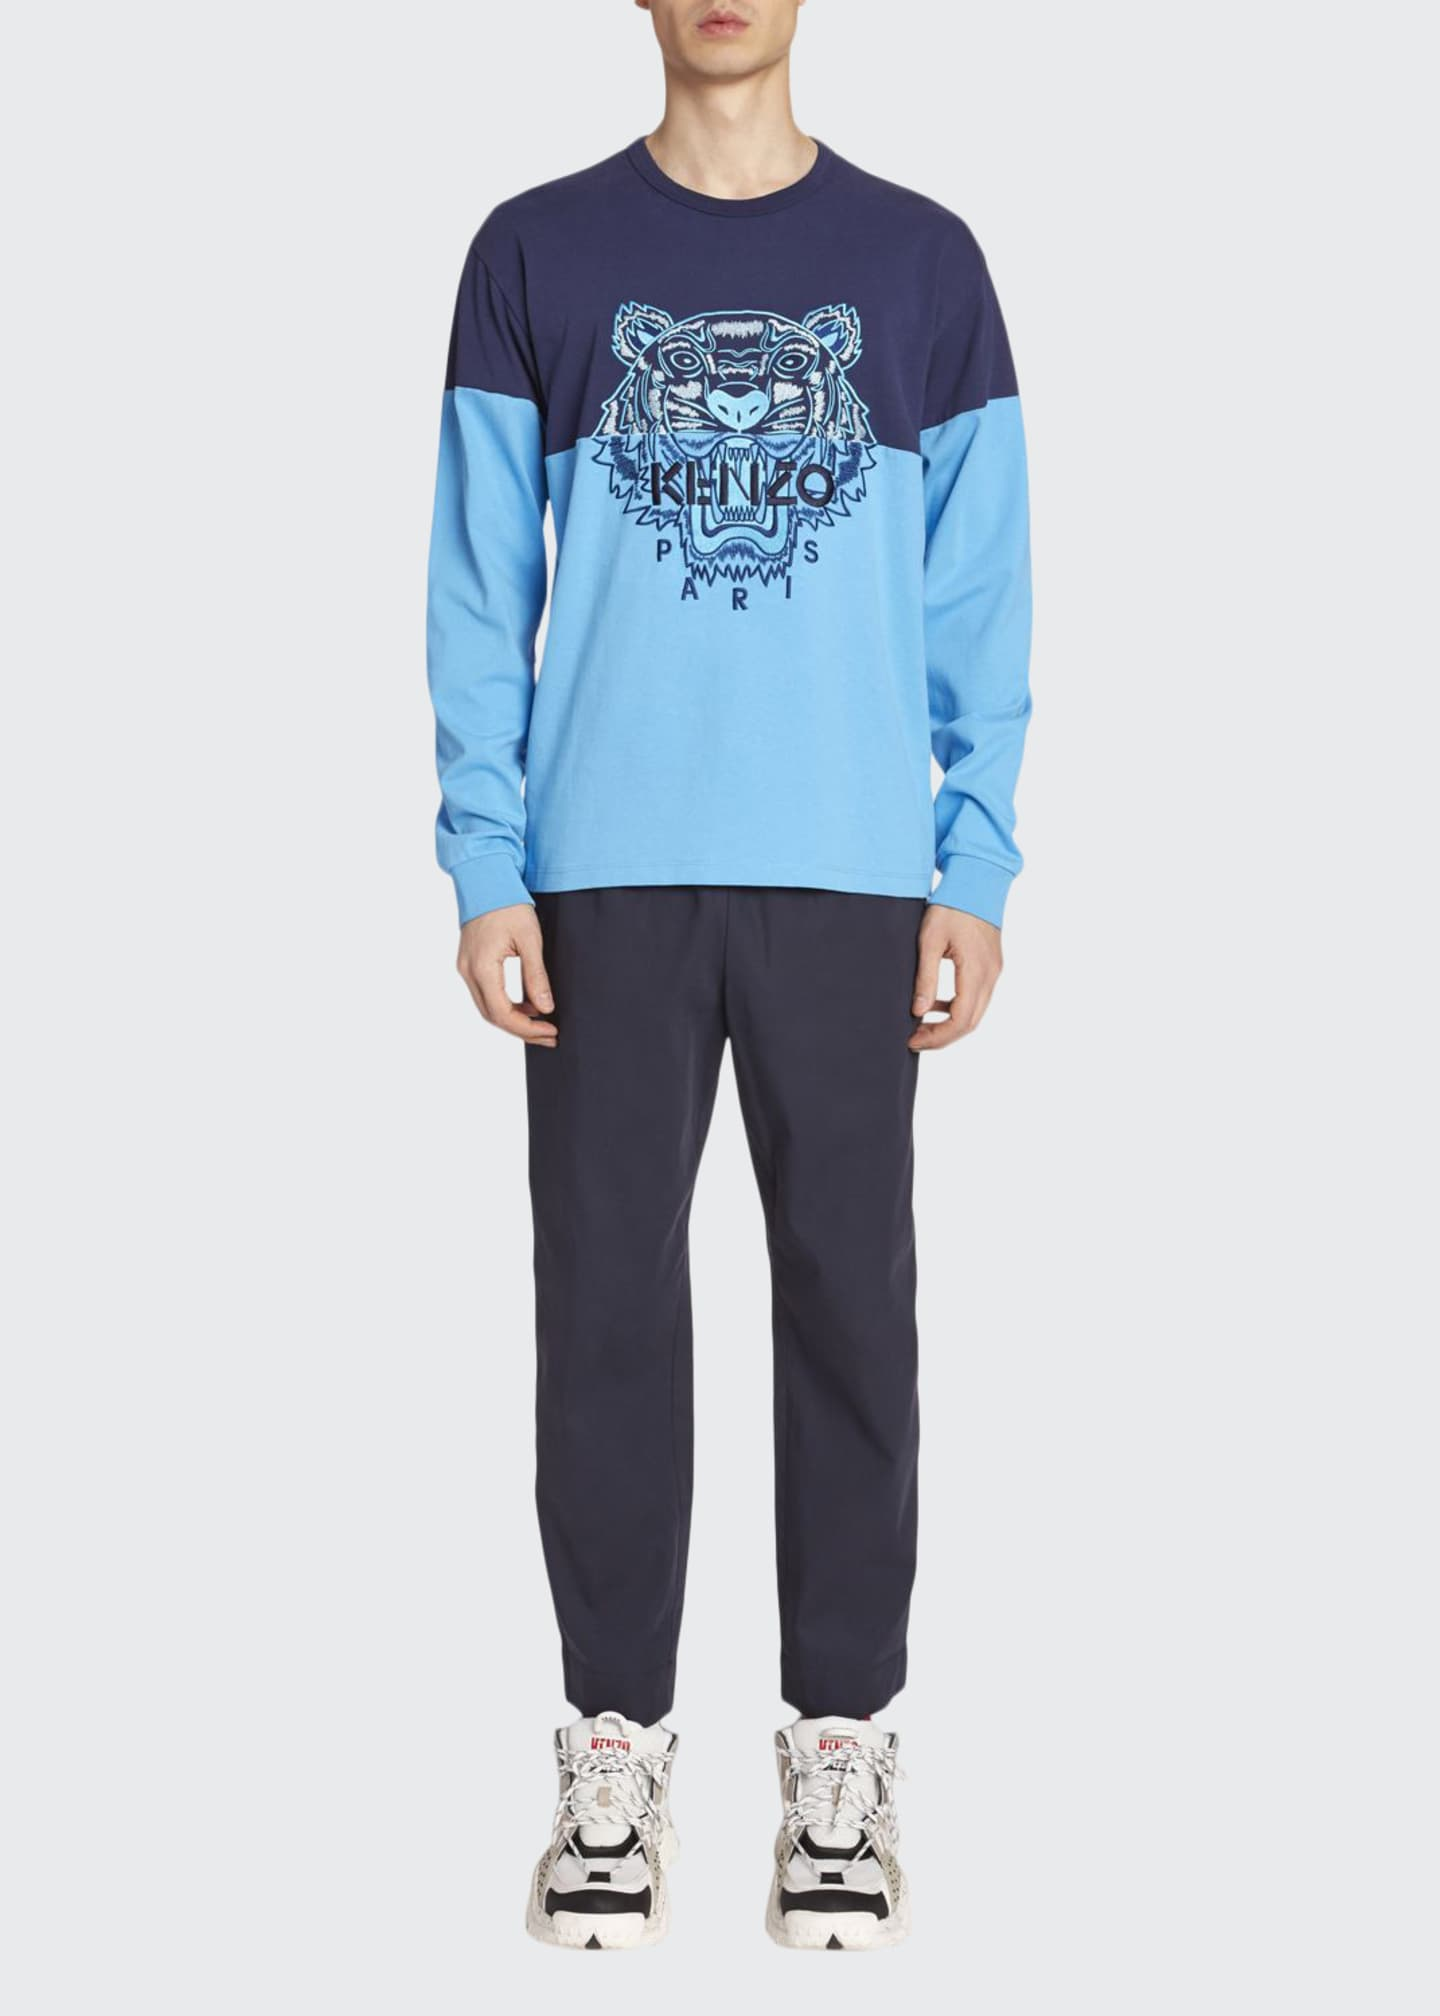 Kenzo Men's Colorblock Tiger Long-Sleeve T-Shirt